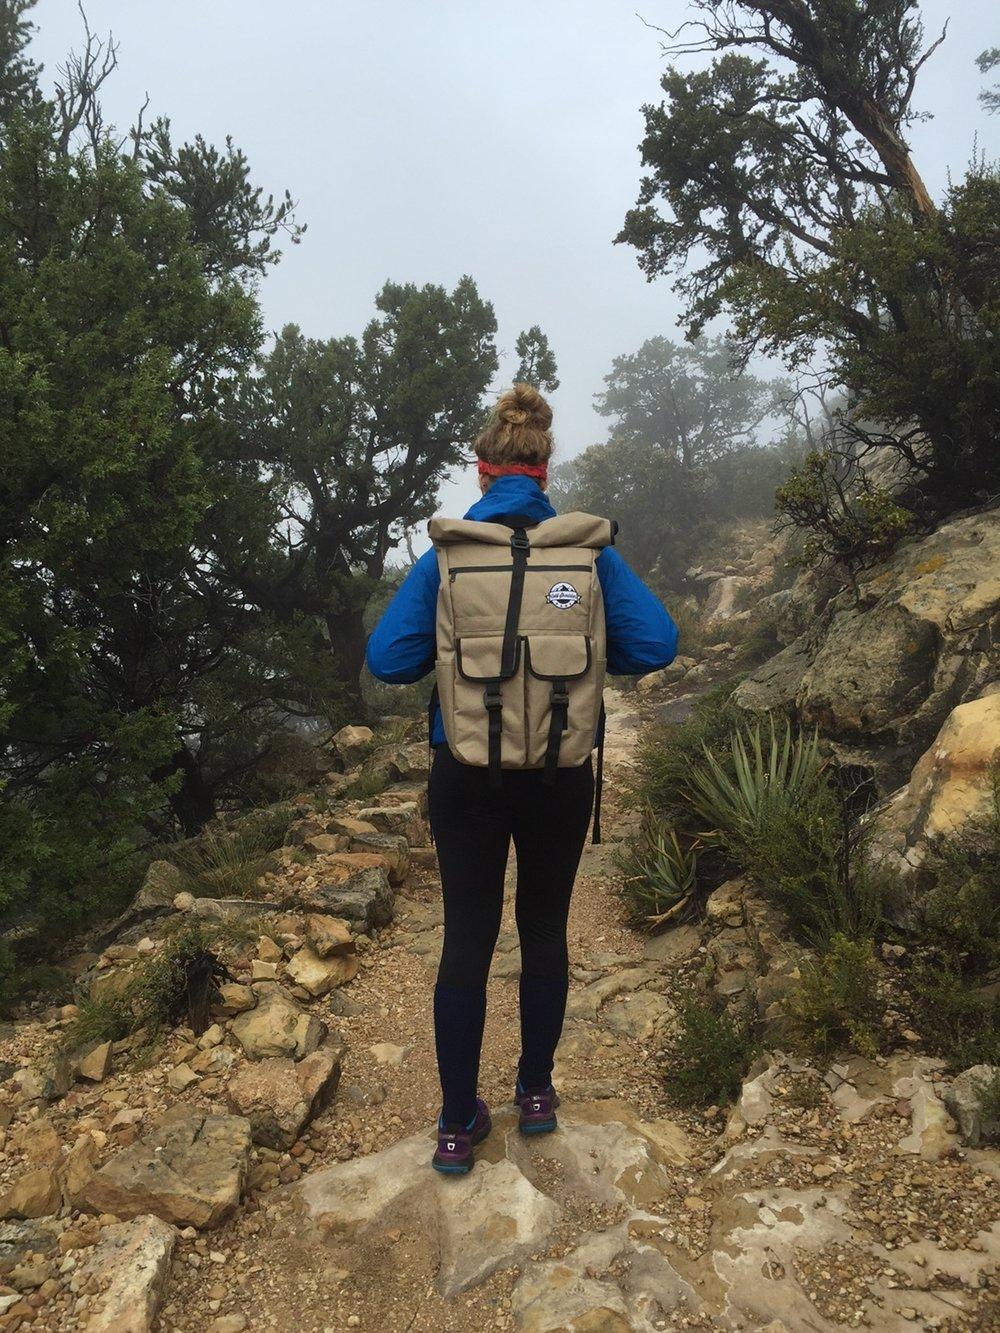 CSB_FrostyTan-Female-Hike-Fog.JPG